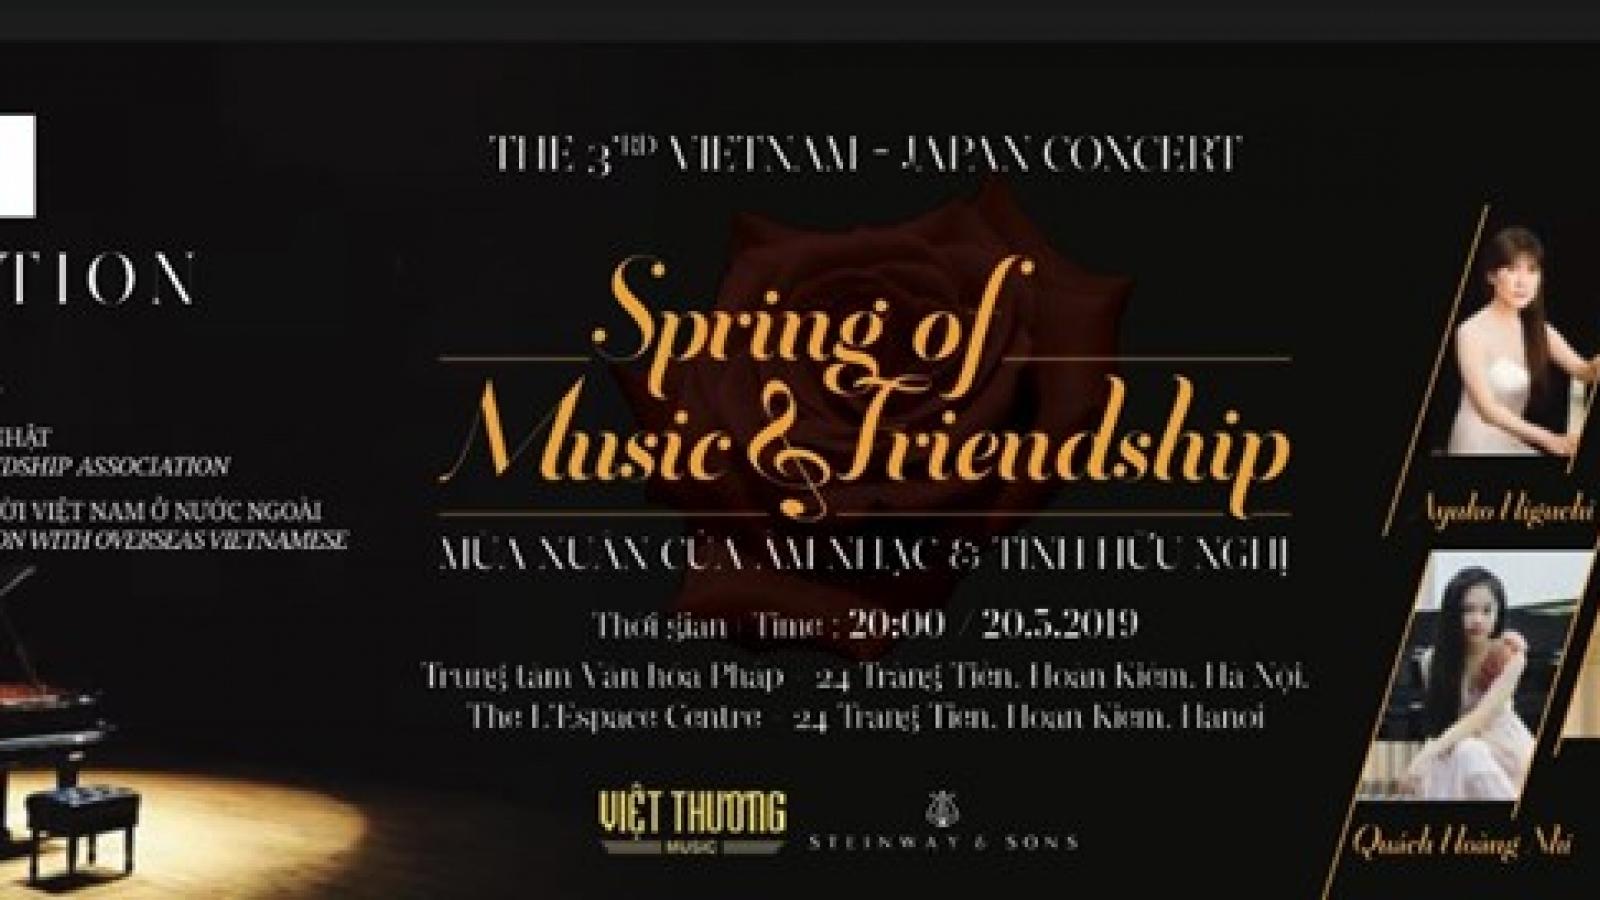 Vietnam-Japan Friendship Concert to take place in Hanoi